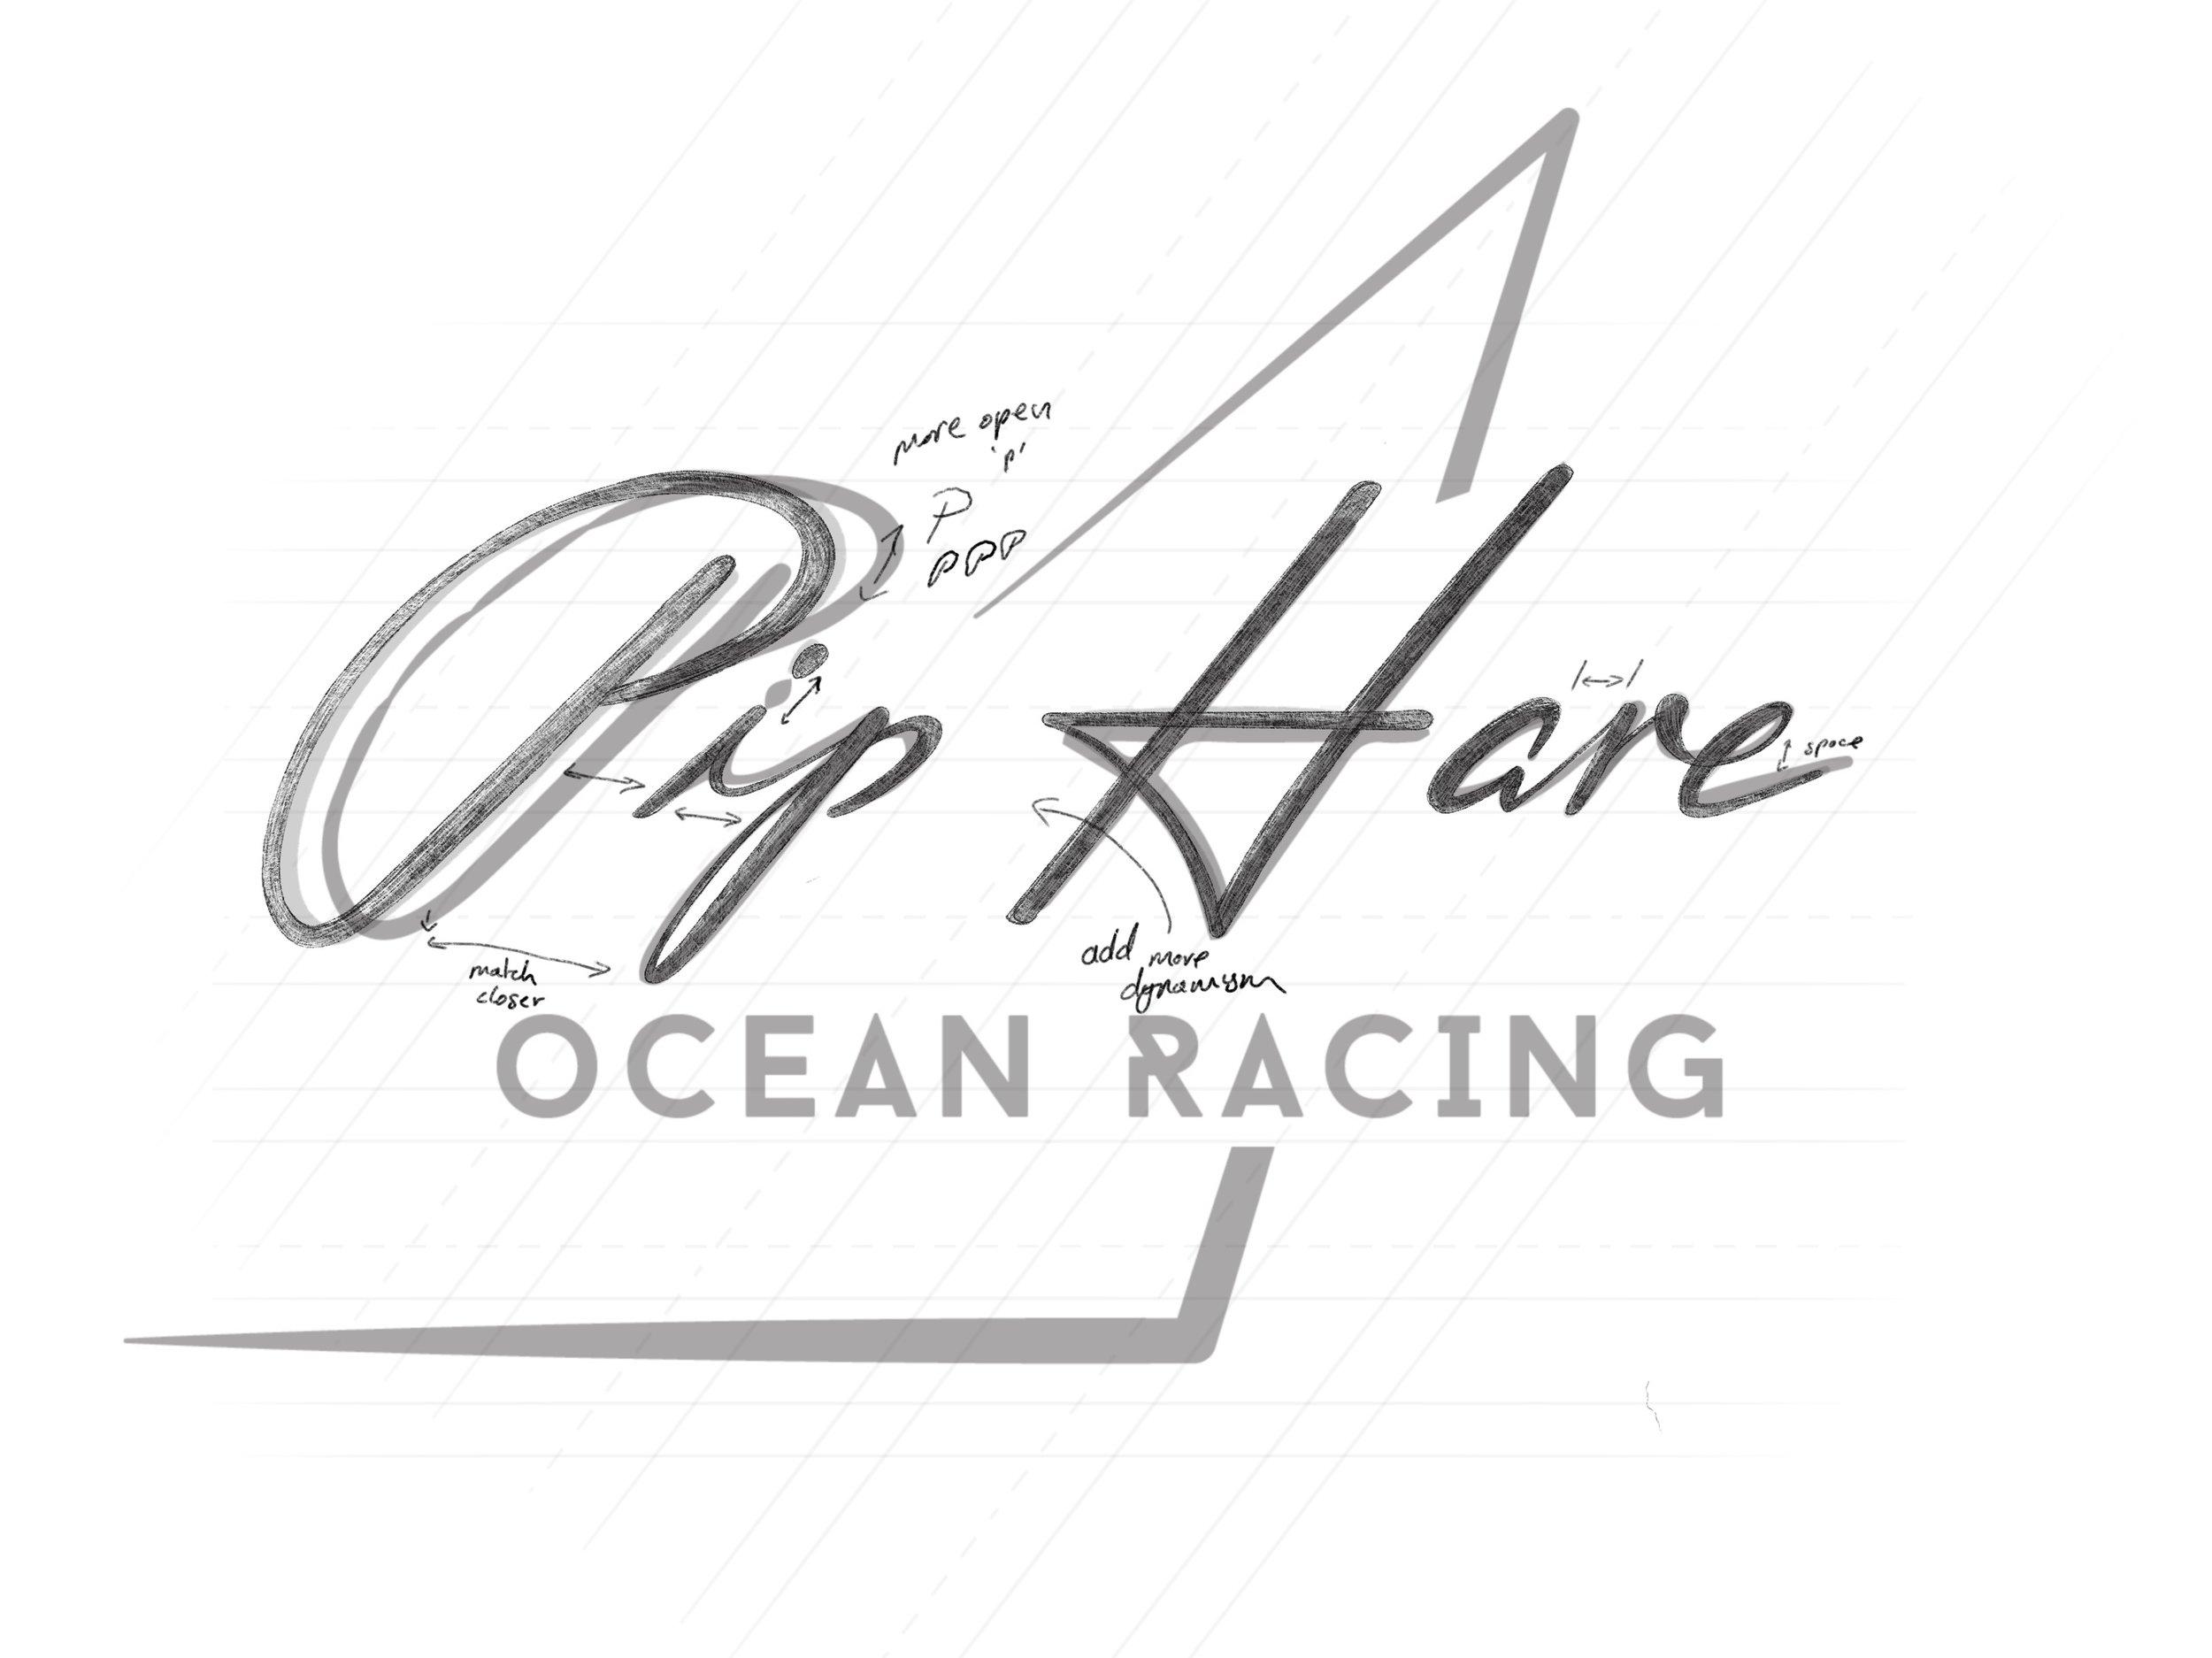 Pete Adams Design Pip Hare Ocean Racing Vendee Logo Edits.jpg